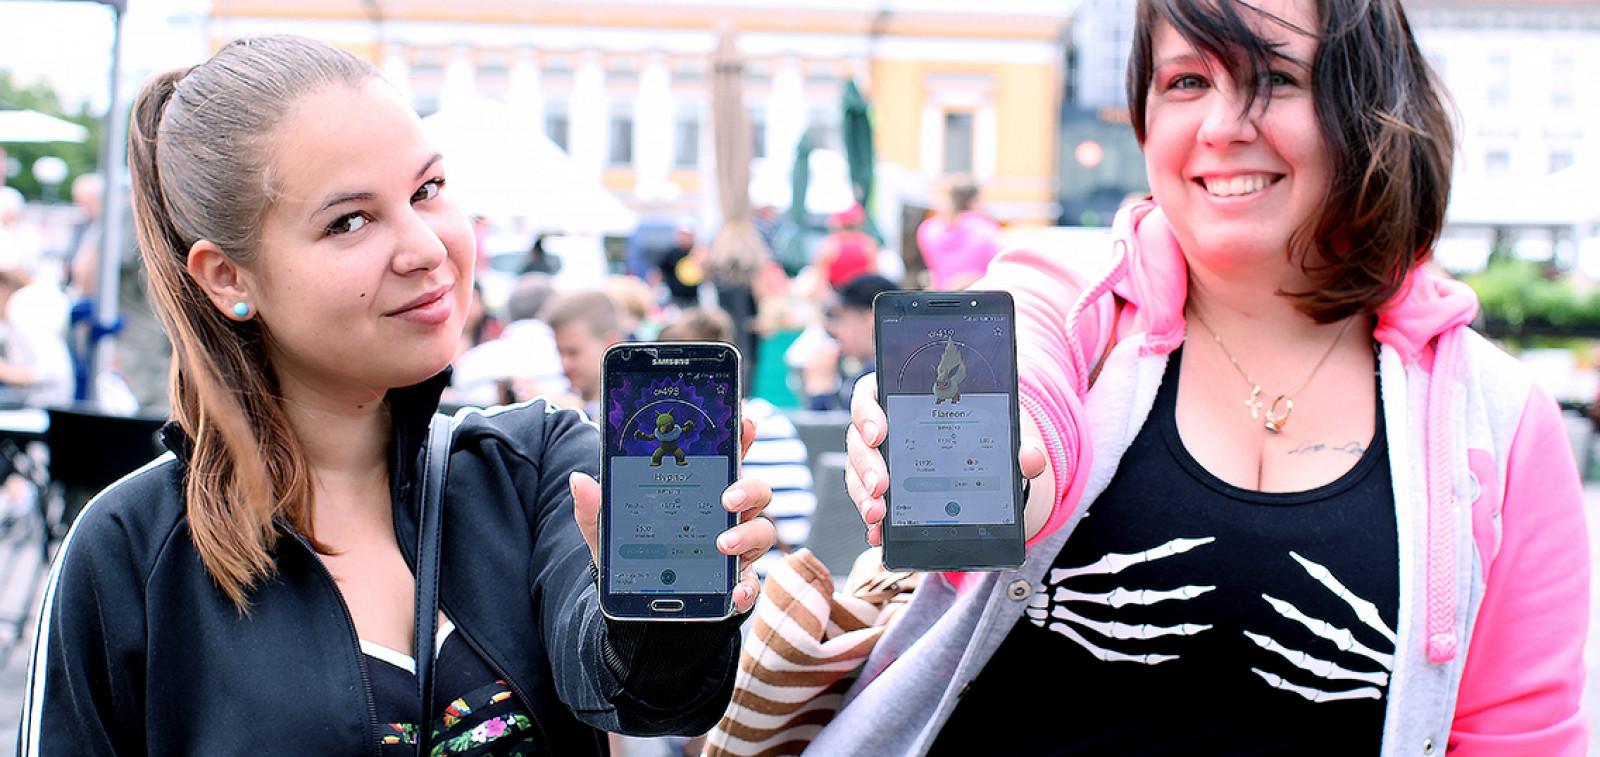 Pokémon Go -pelaajat Kauppatorilla